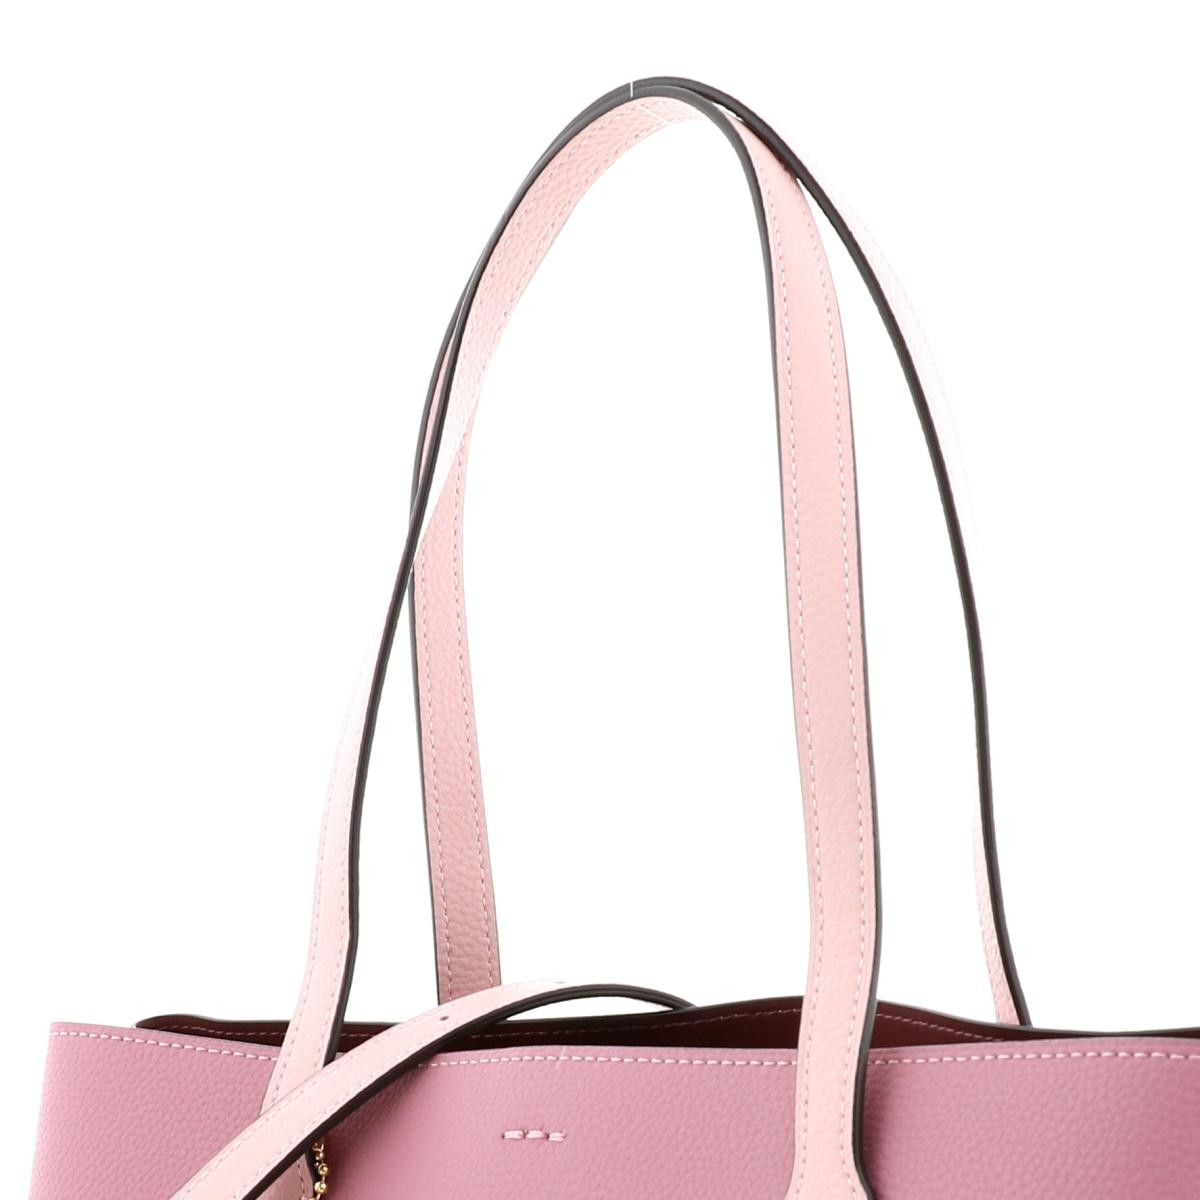 【SALE】【中古】 COACH コーチ DISNEY×COACH アヴェニュートート 2WAY バッグ トートバッグ DISNEY Pink/ピンク ミッキー スケートボード 3711 used:A